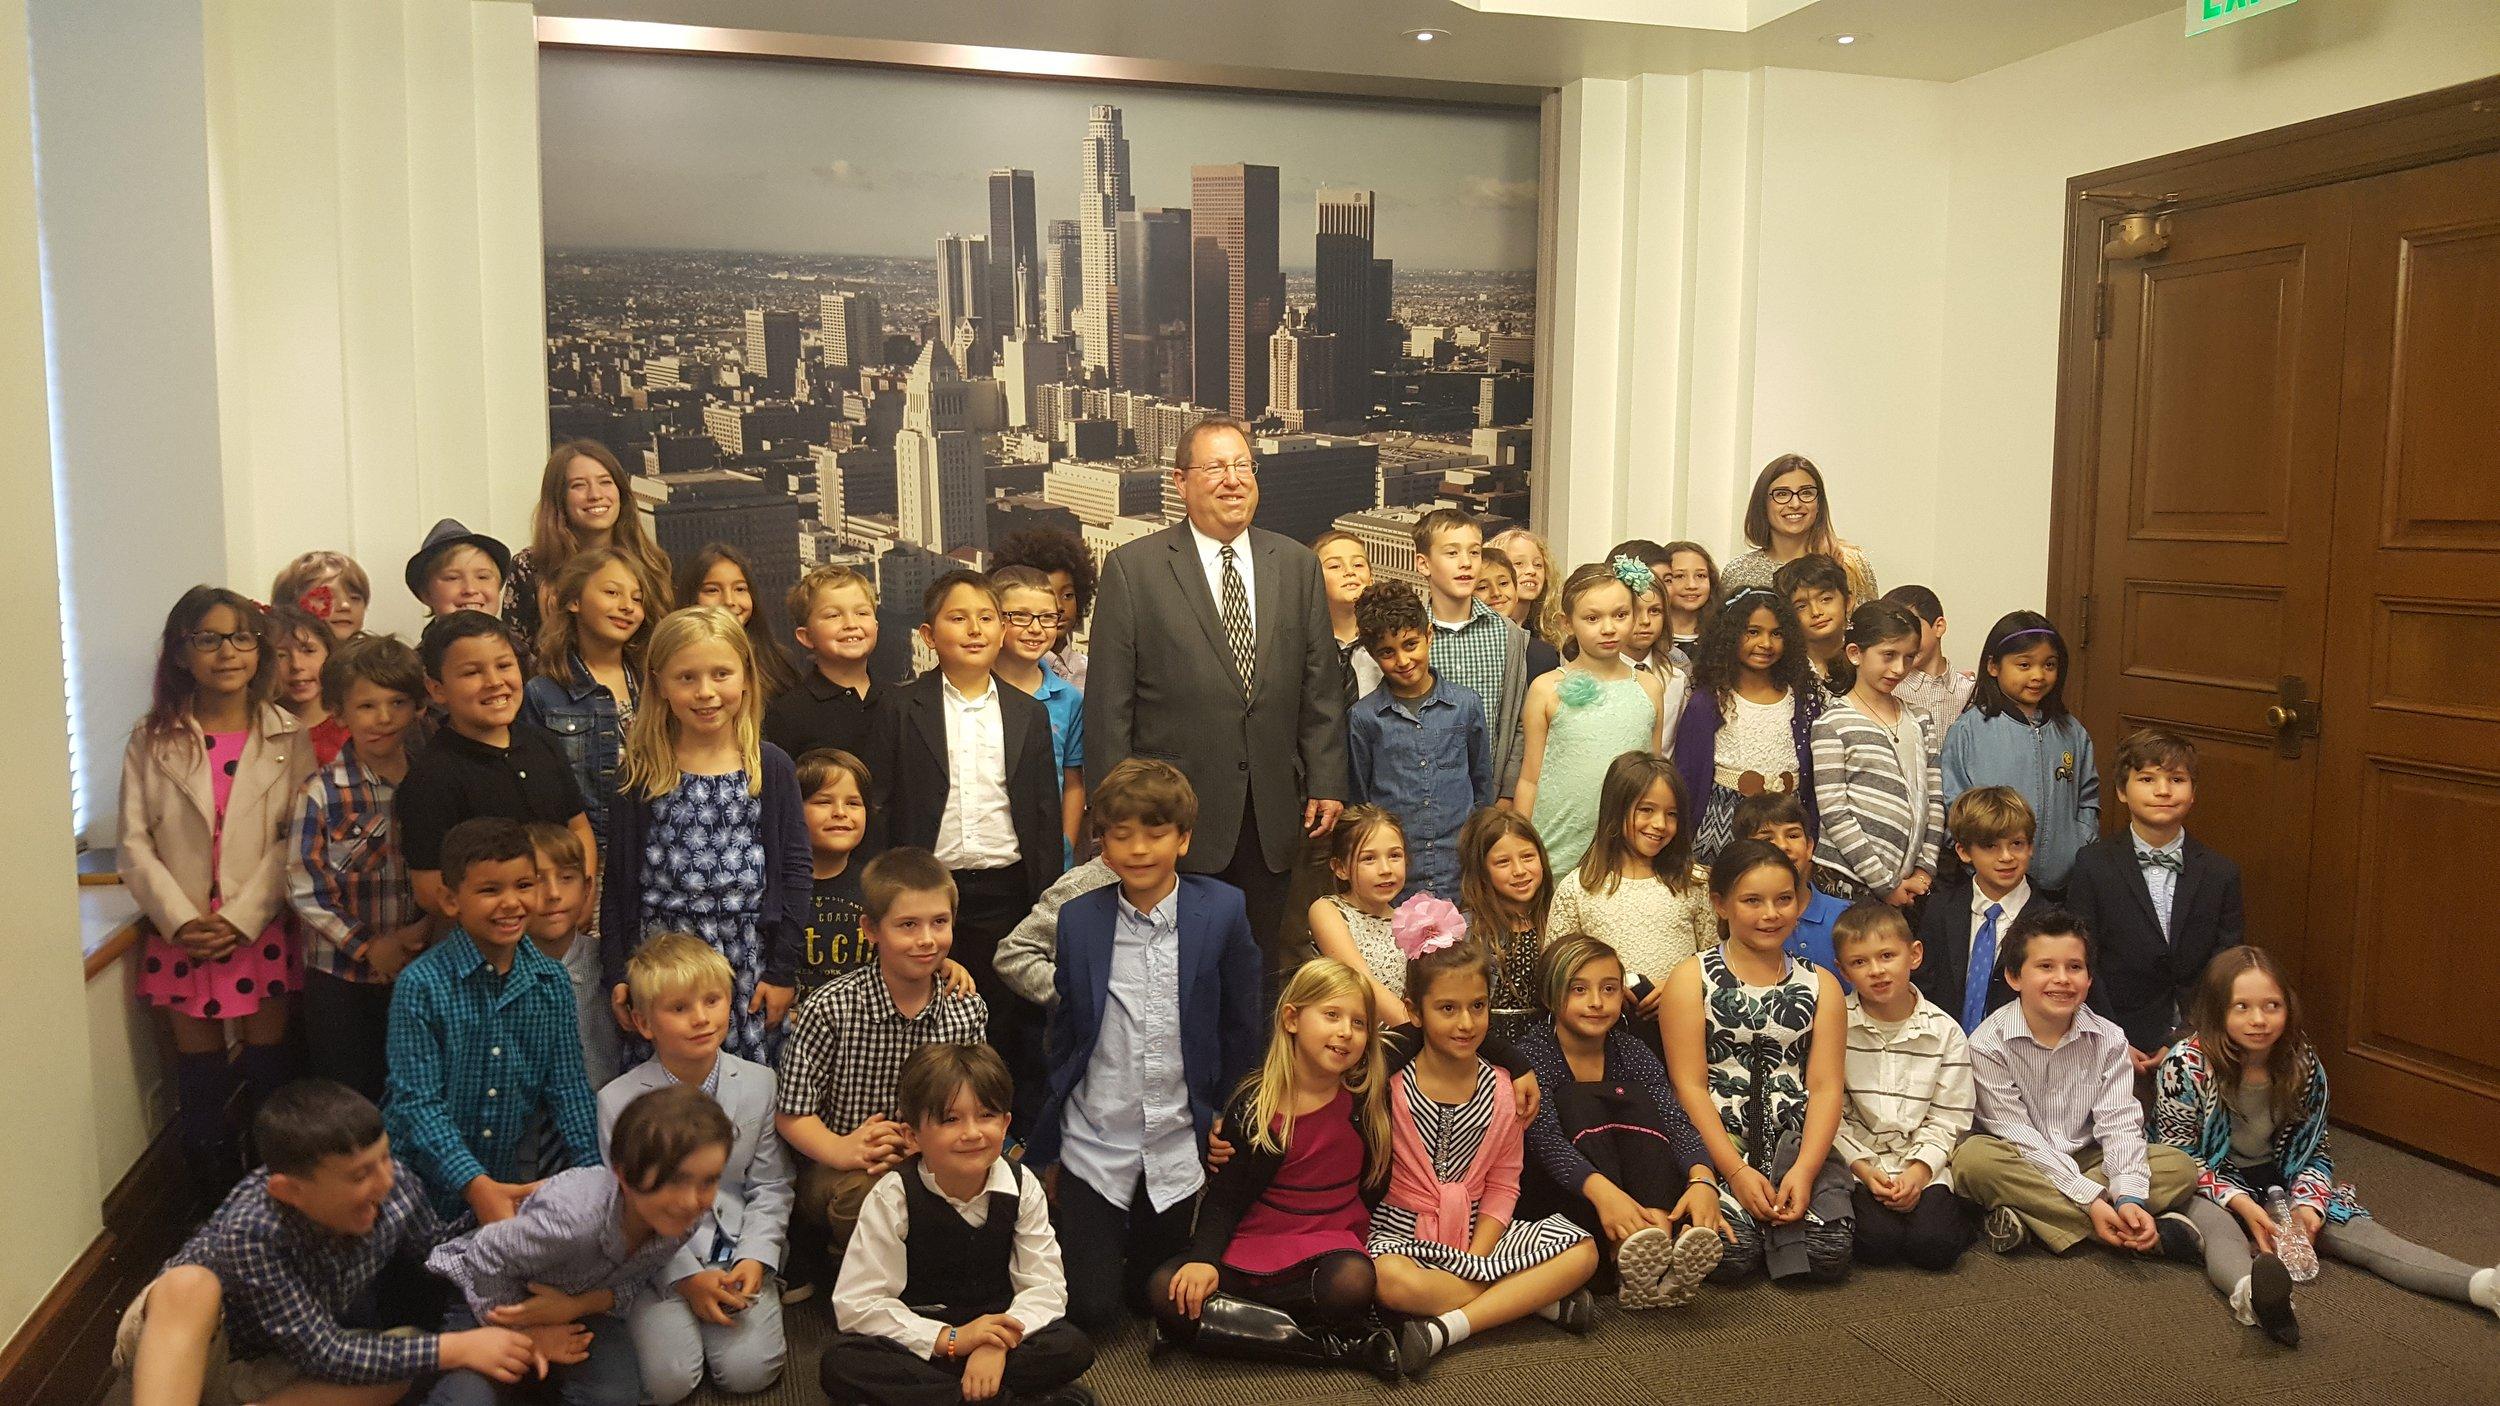 CLAW Kids from iLEAD Encino meet with Councilmember Paul Koretz